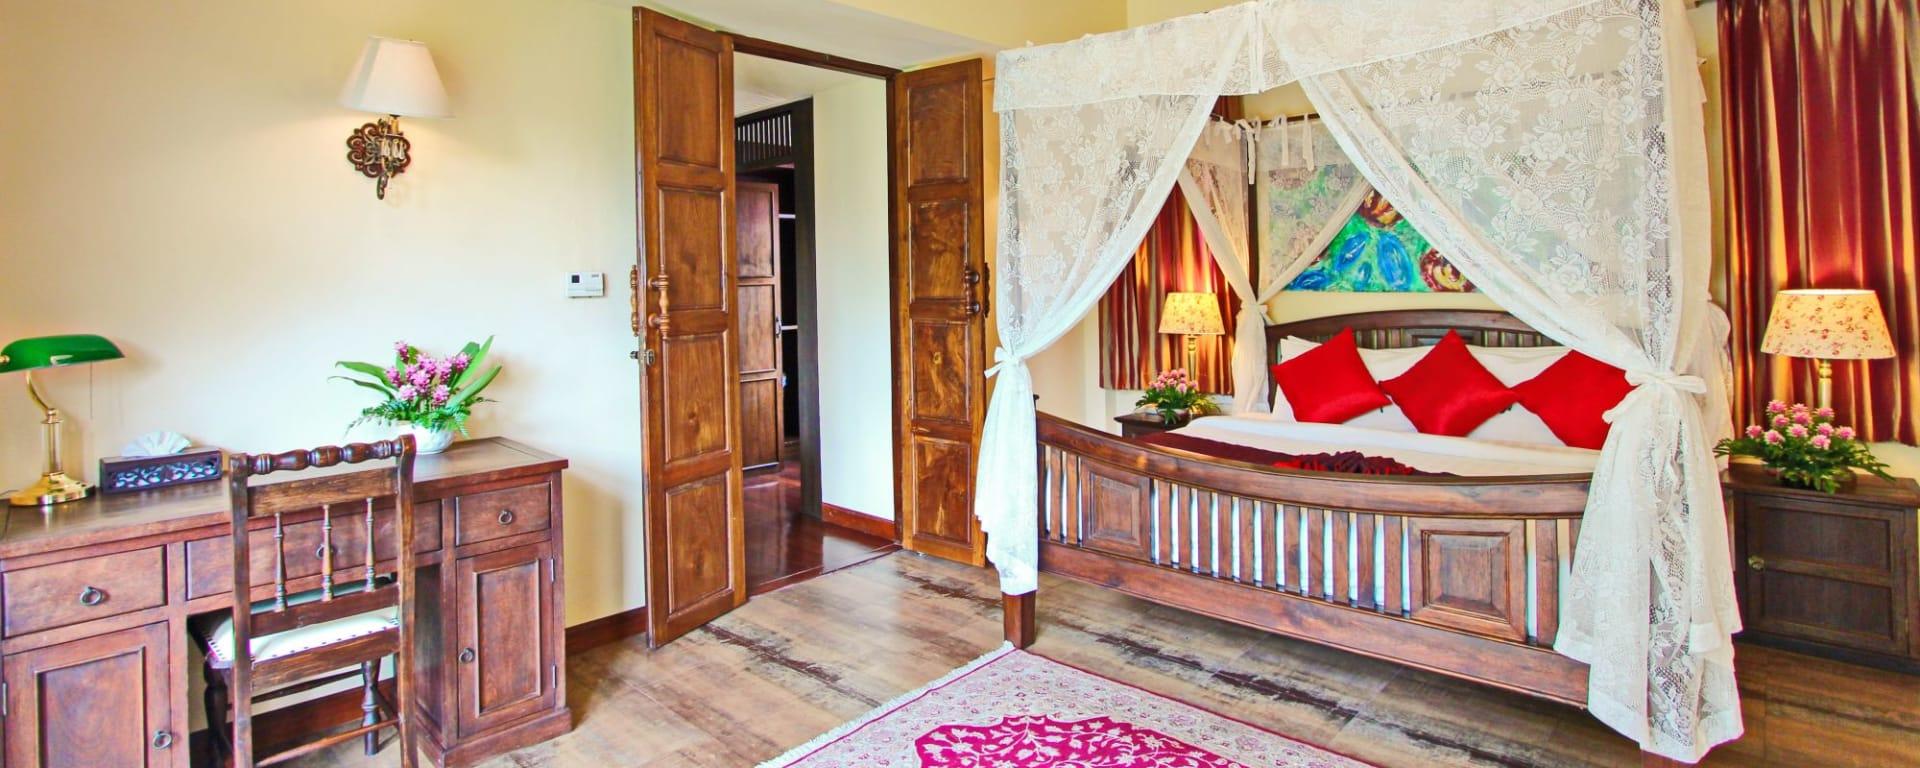 Shewe Wana Suite Resort in Chiang Mai: 1-BR Suite With Jet Tub   Shewe Wana Suite Resort